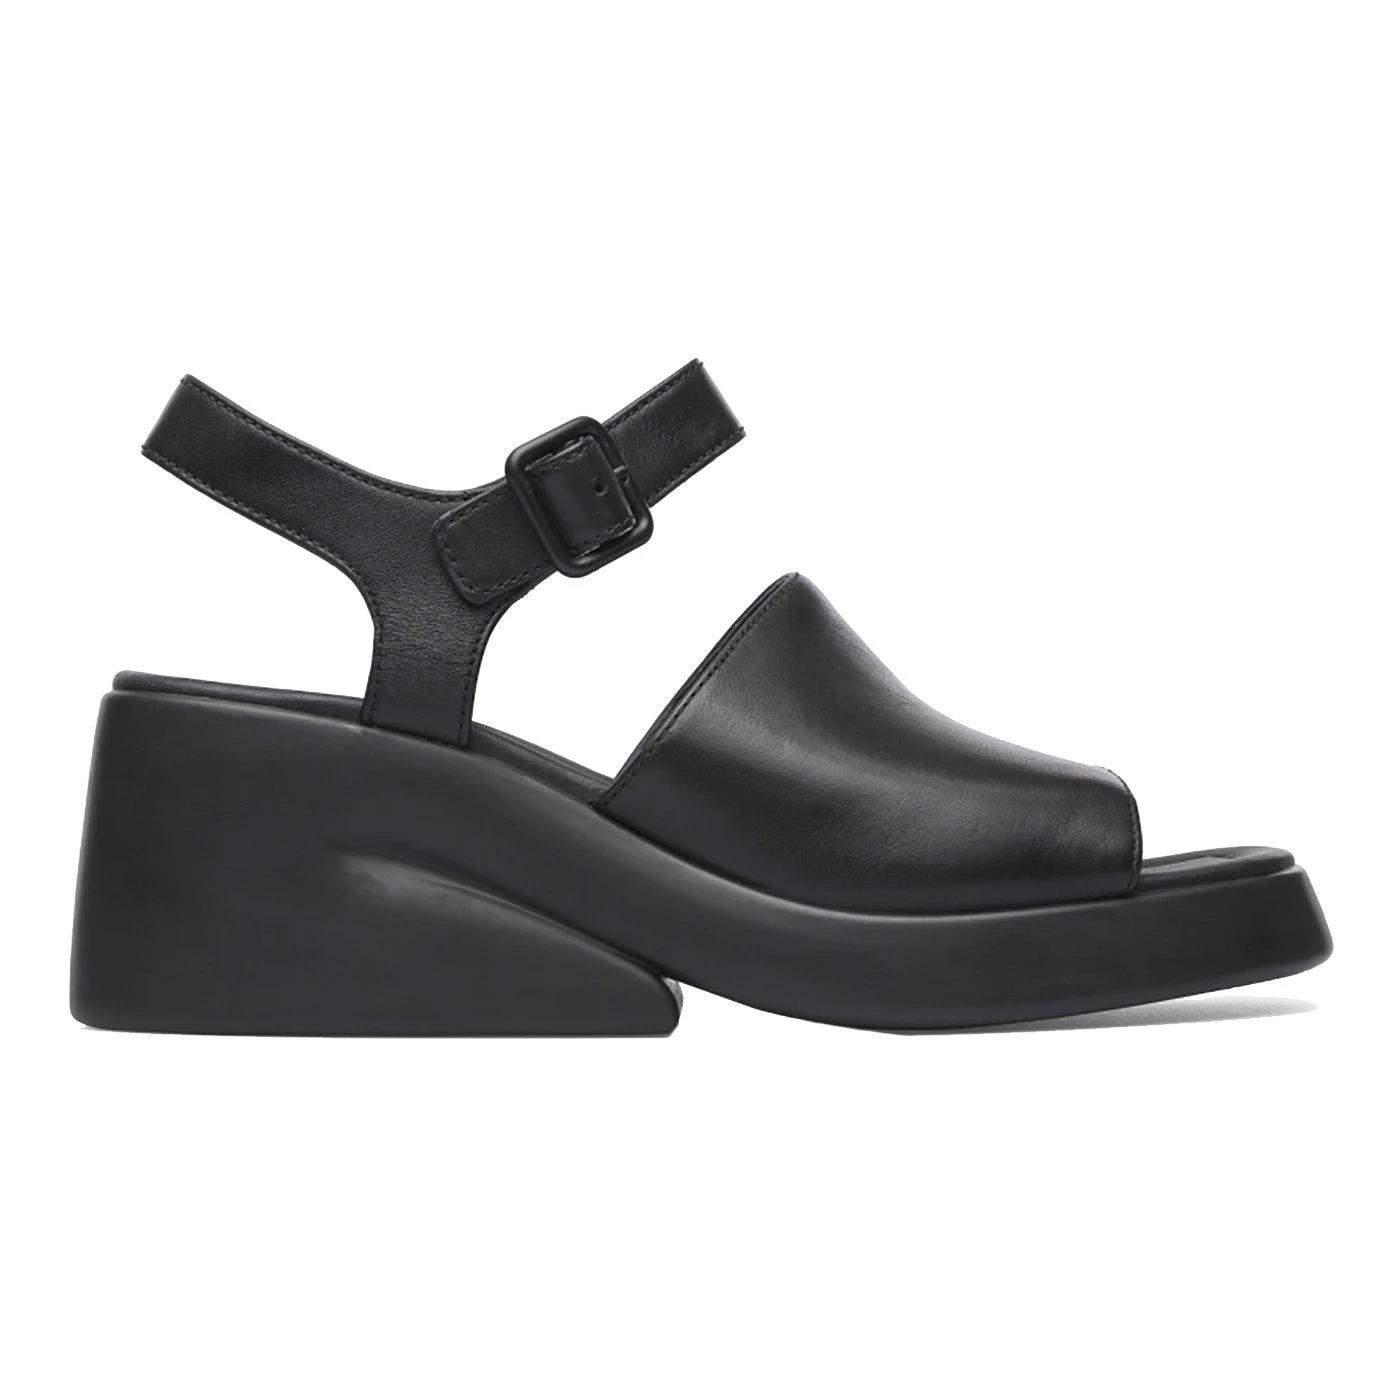 Camper K201213-001 sandalo da donna in pelle nera